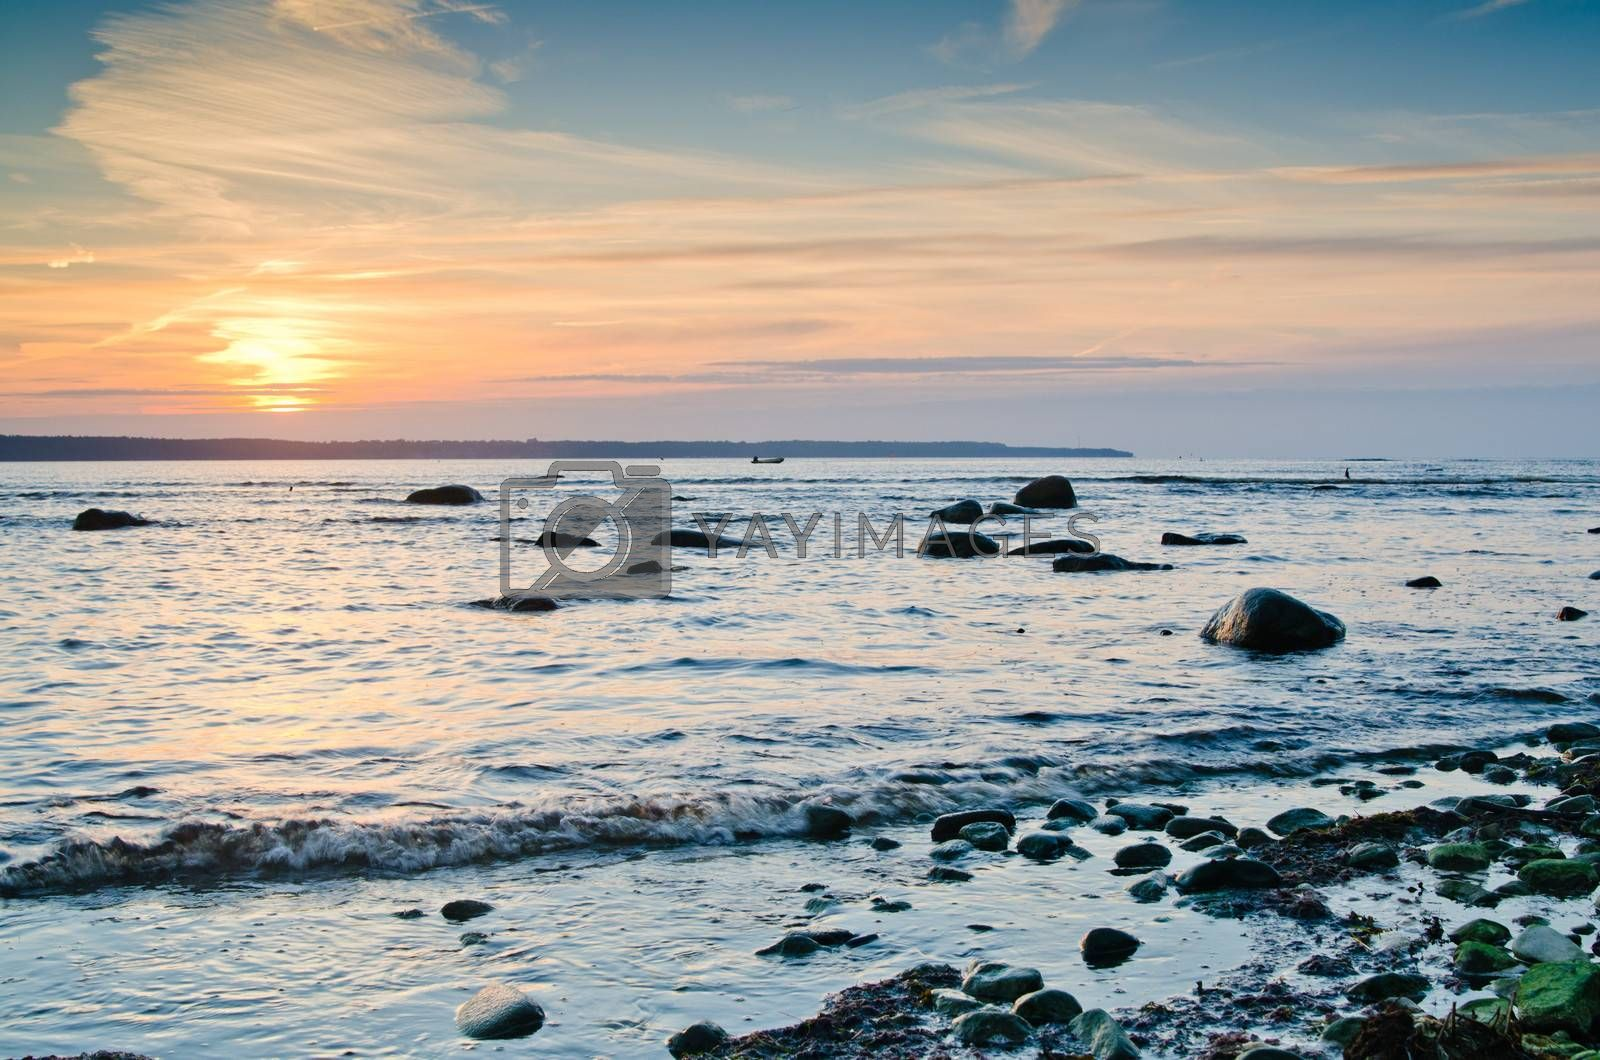 Coast of the Baltic Sea at sunset